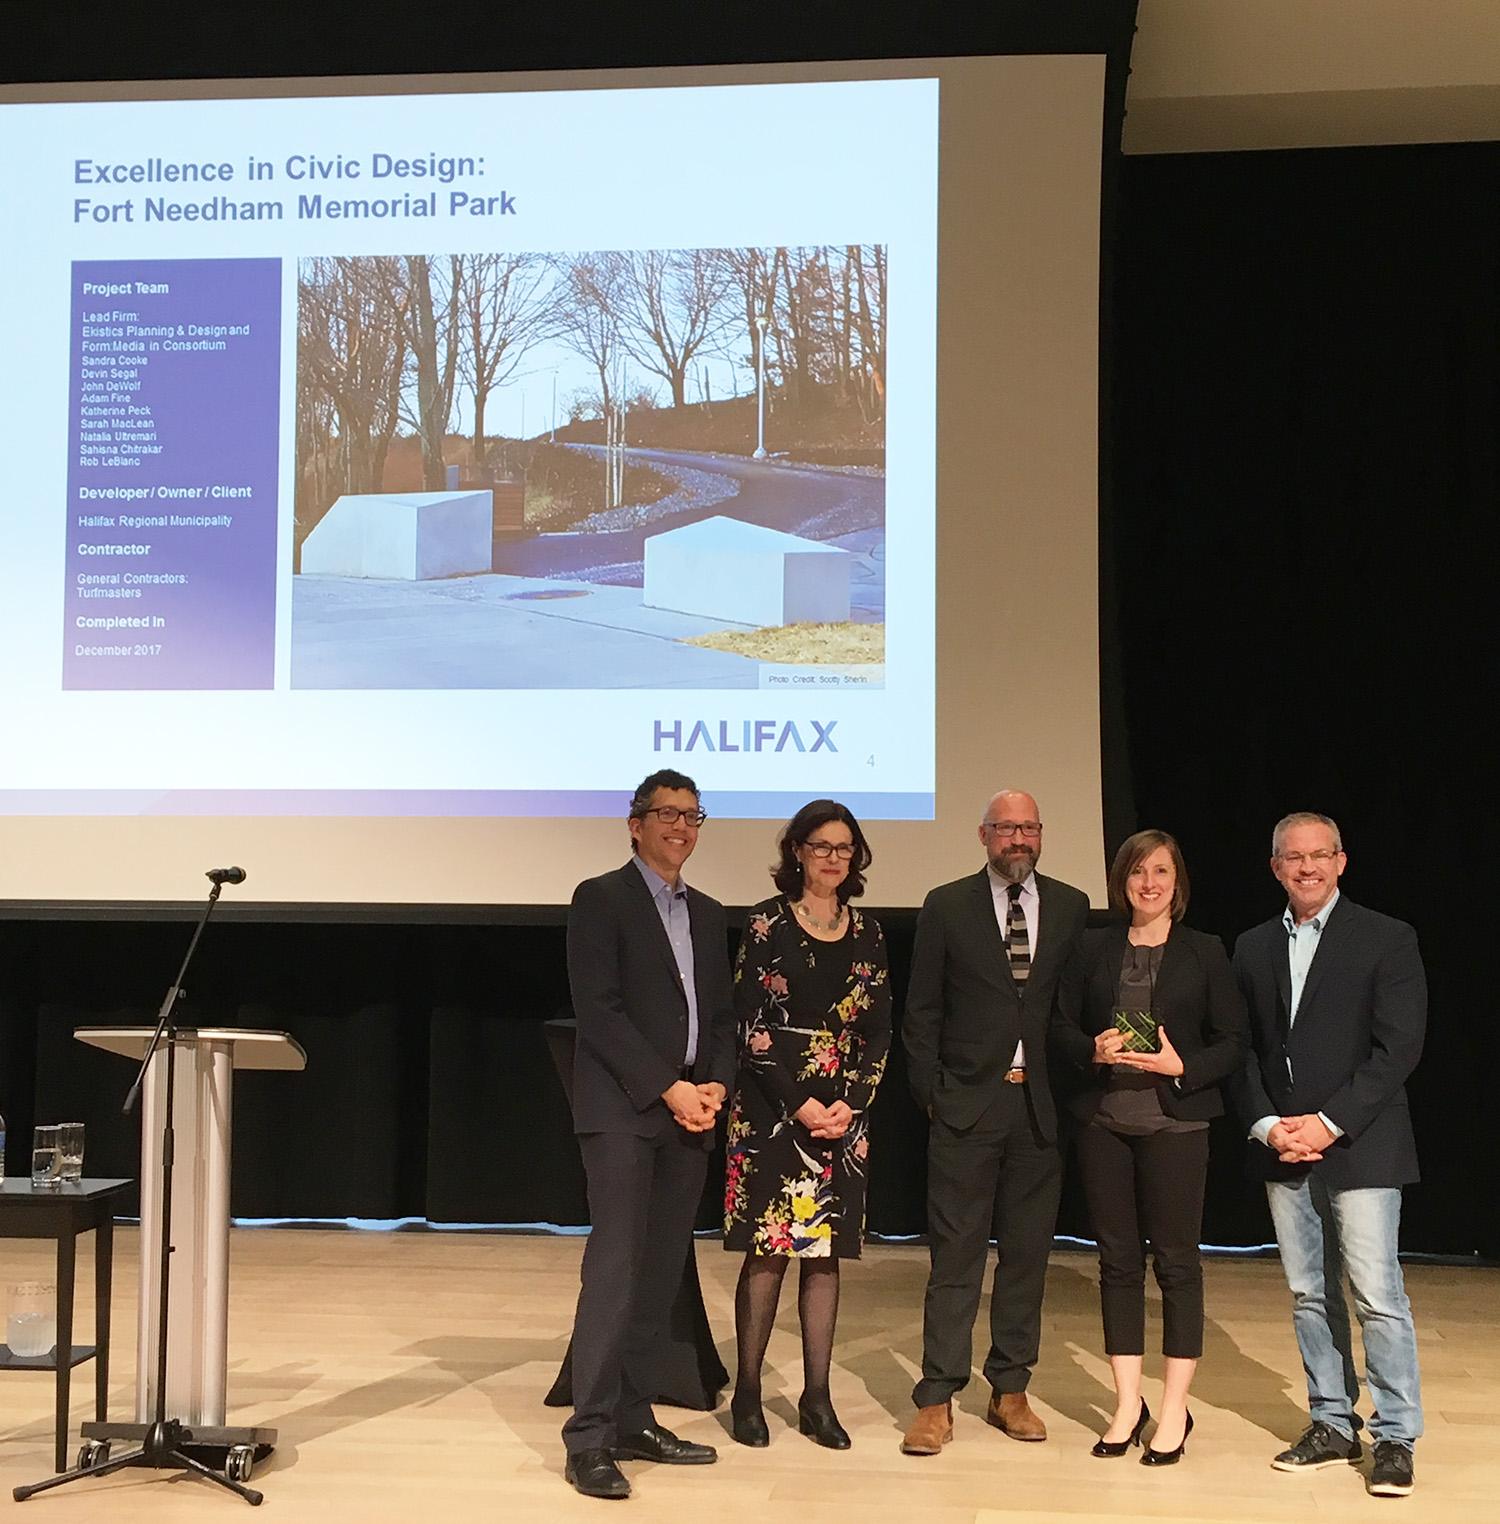 Halifax Urban Design Awards Jurors Antonio Gomez-Palacio and Anne McIlroy, John DeWolf - Form: Media, Sandra Cooke - Ekistics Plan + Design, Rob LeBlanc - Ekisitcs Plan + Design & Form: Media  Photo: Ekistics Plan + Design